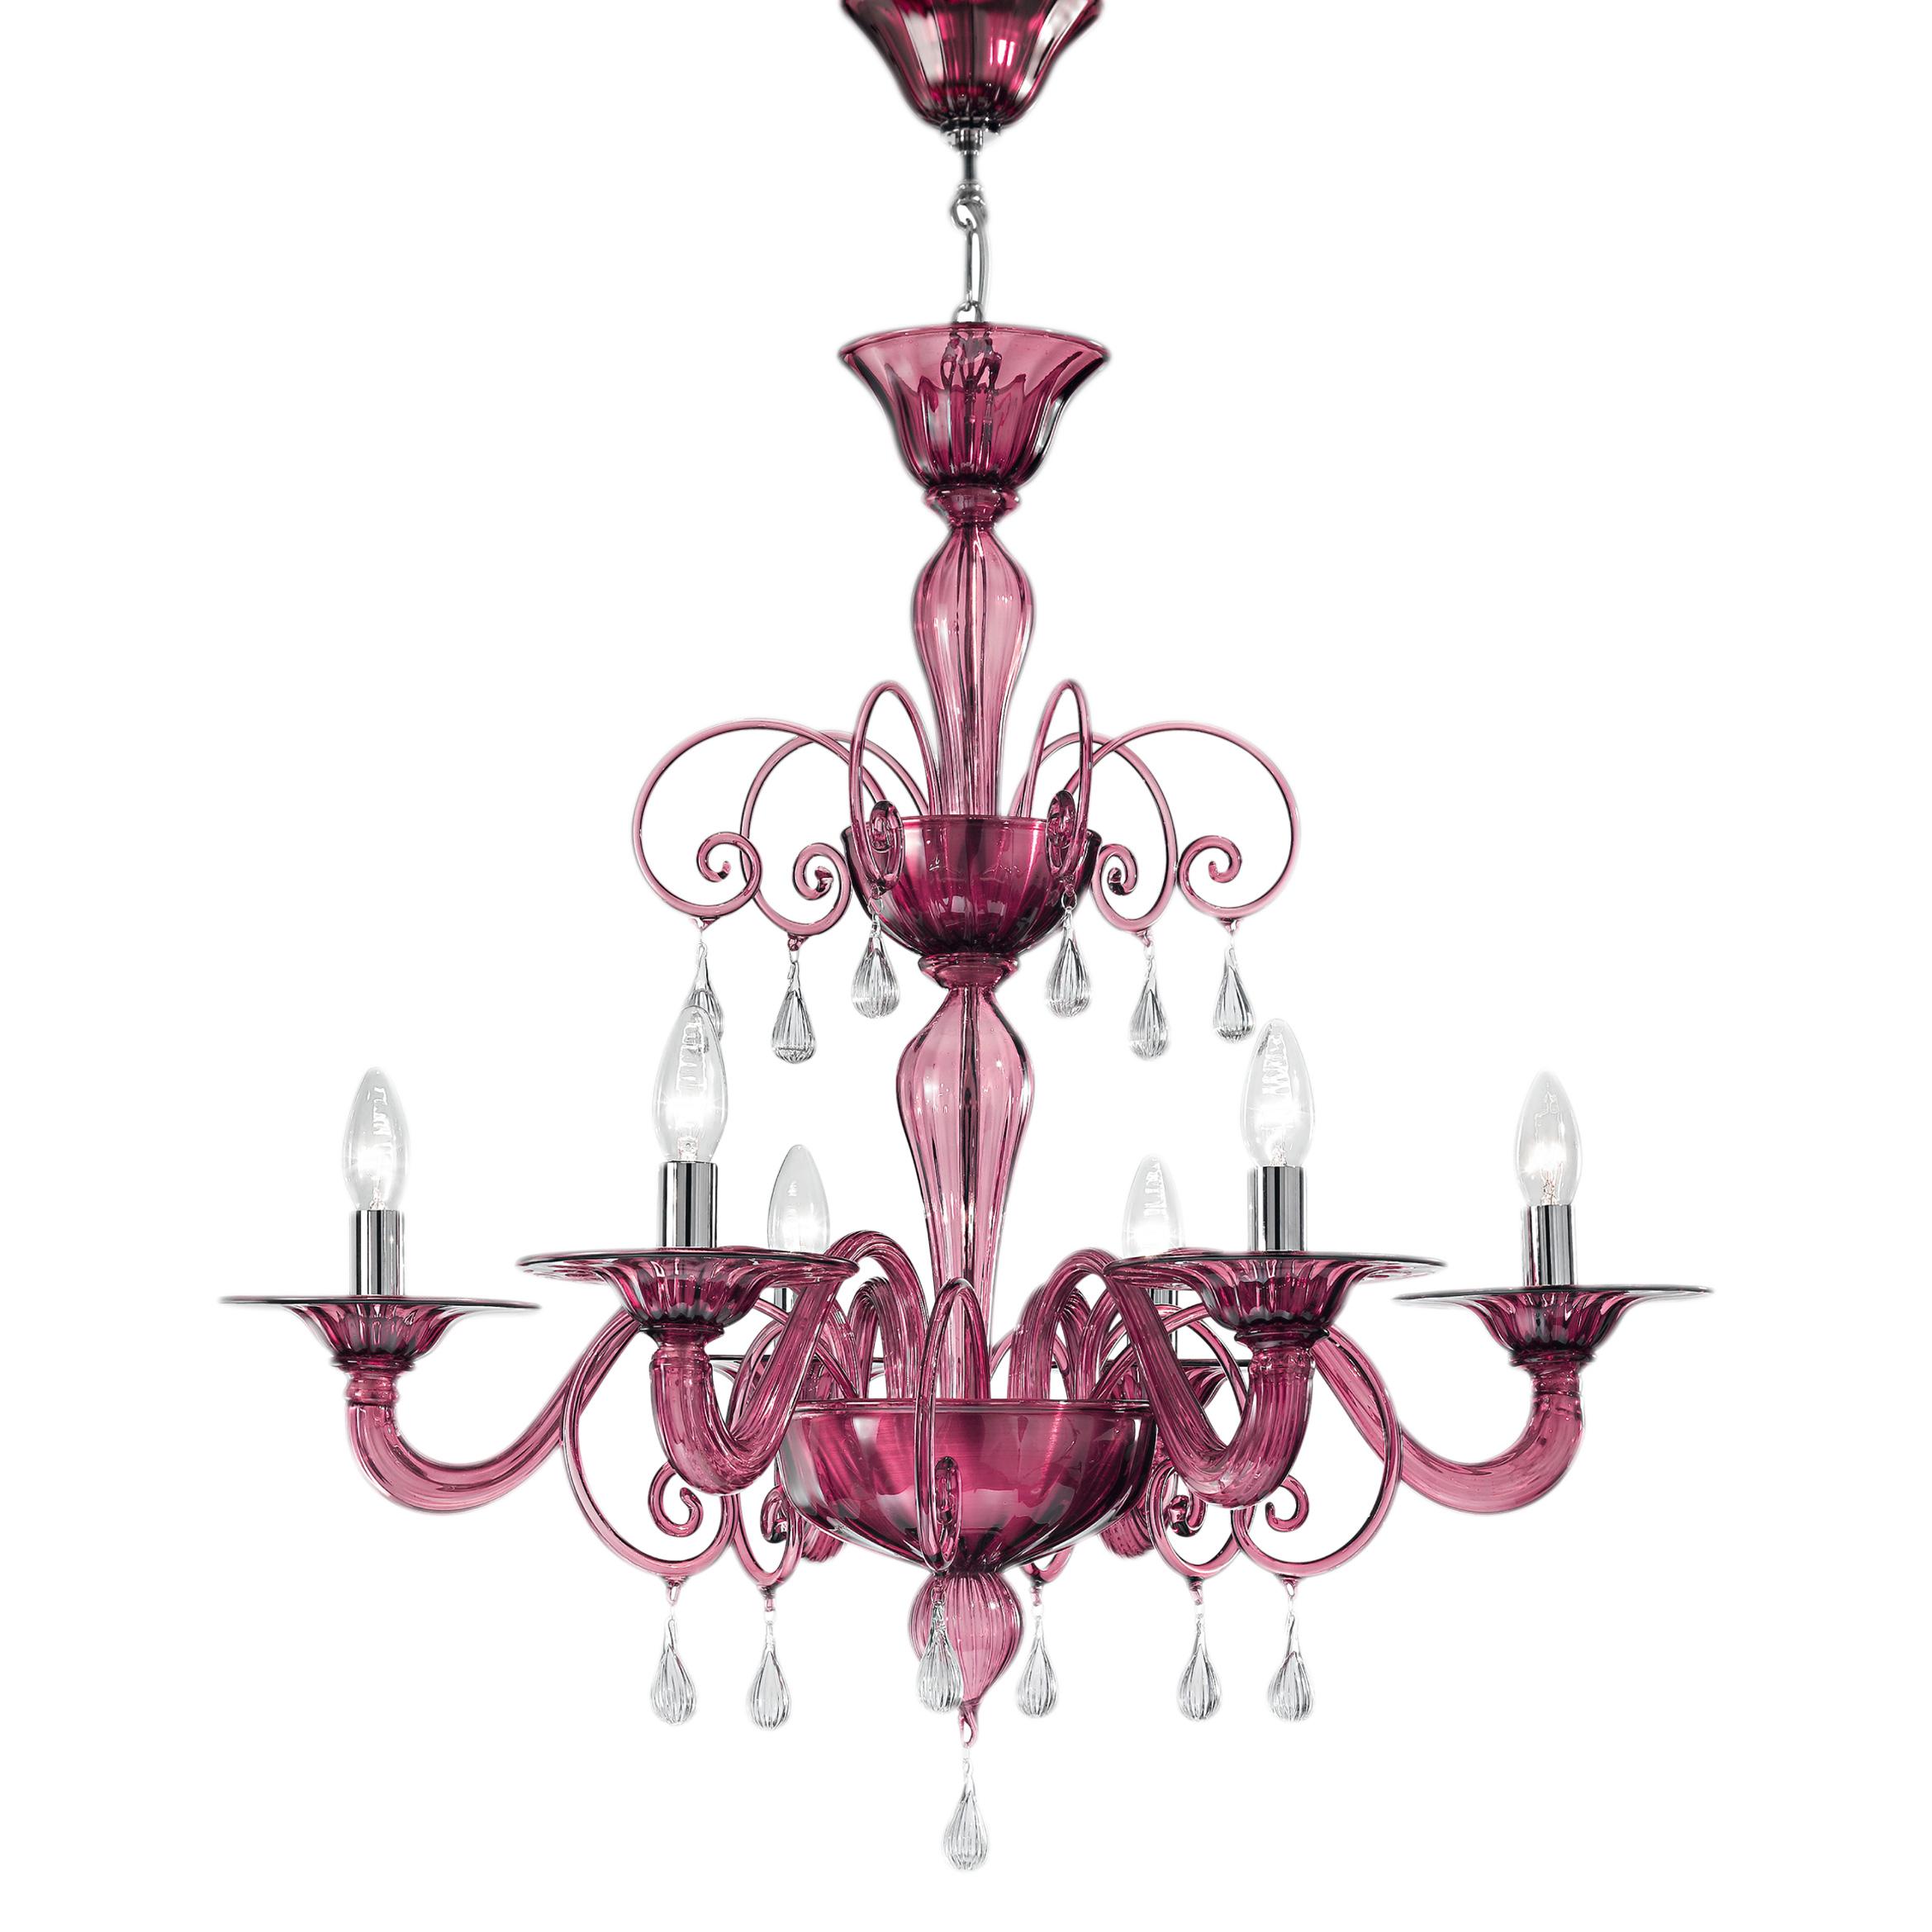 Jasmine villaverde london villaverde london jasmine amethyst murano chandelier square mozeypictures Gallery